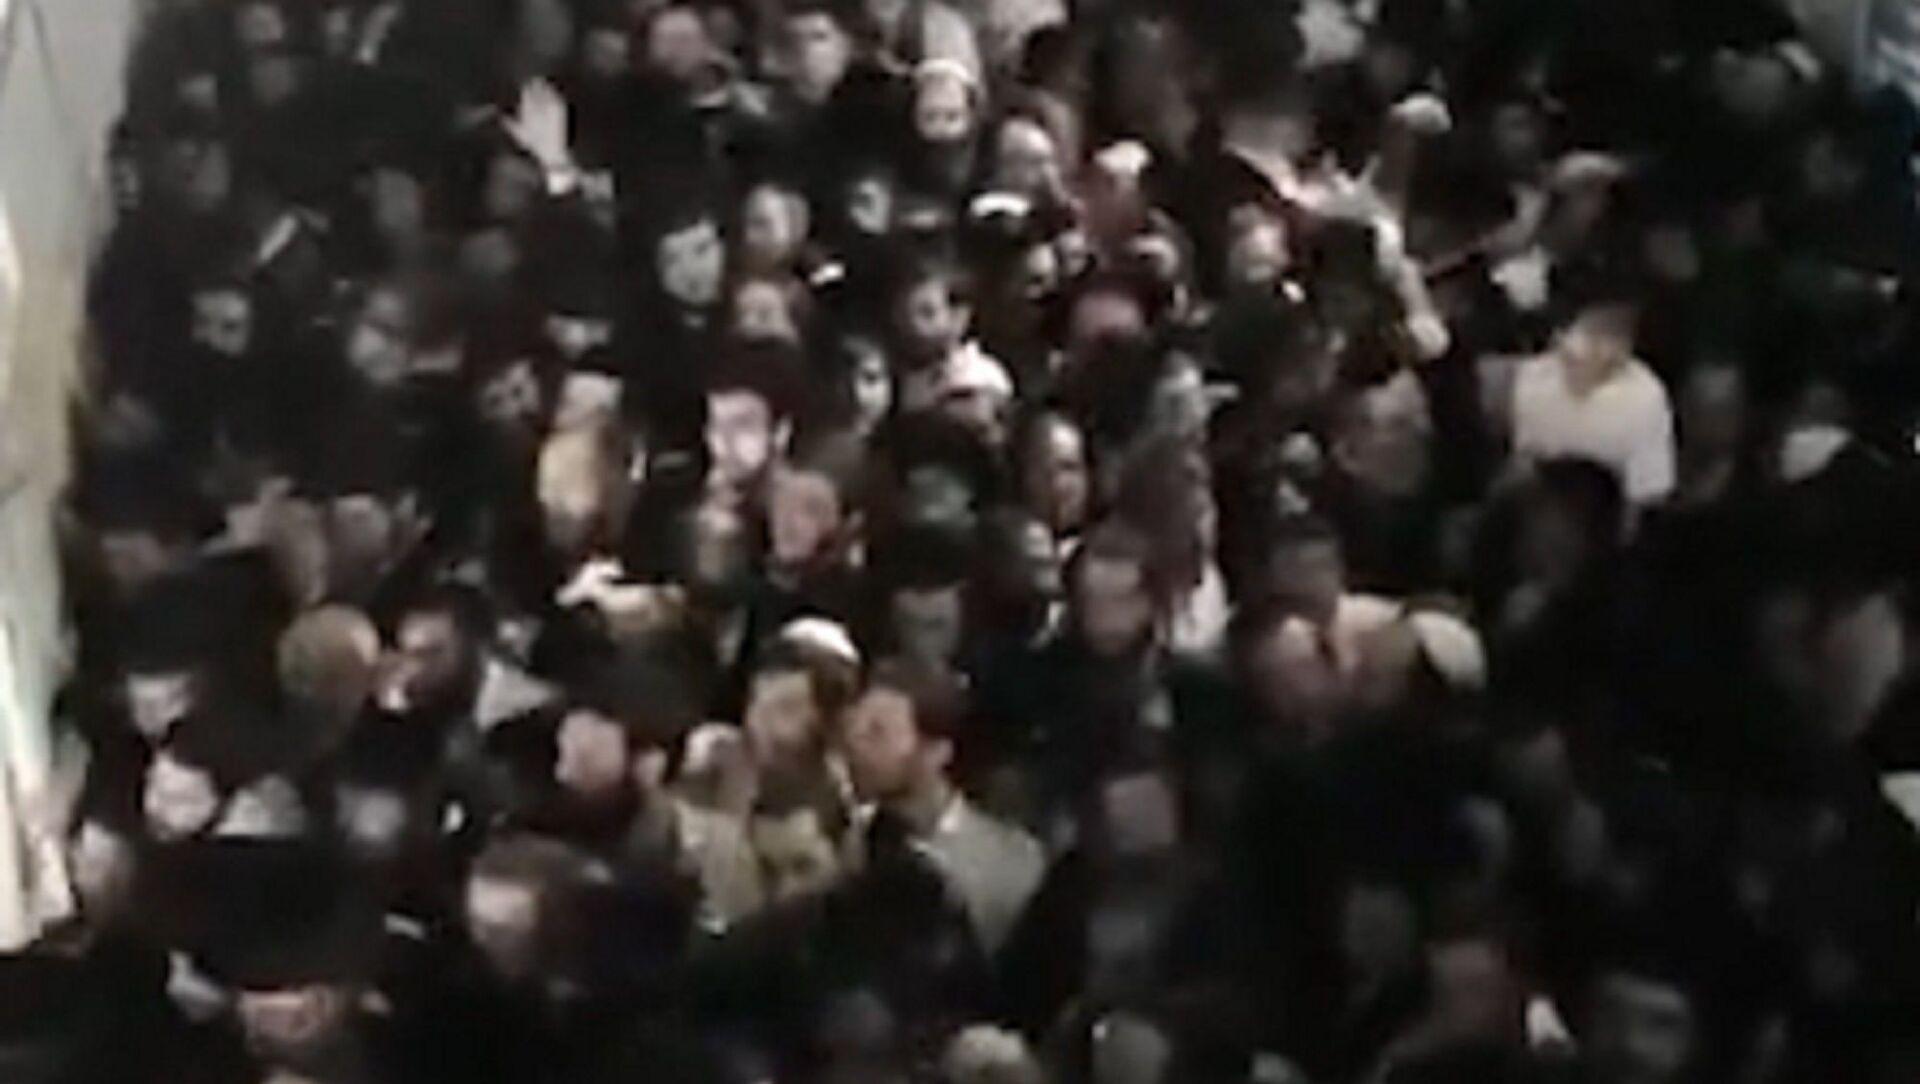 Israele, strage al raduno religioso - Sputnik Italia, 1920, 30.04.2021